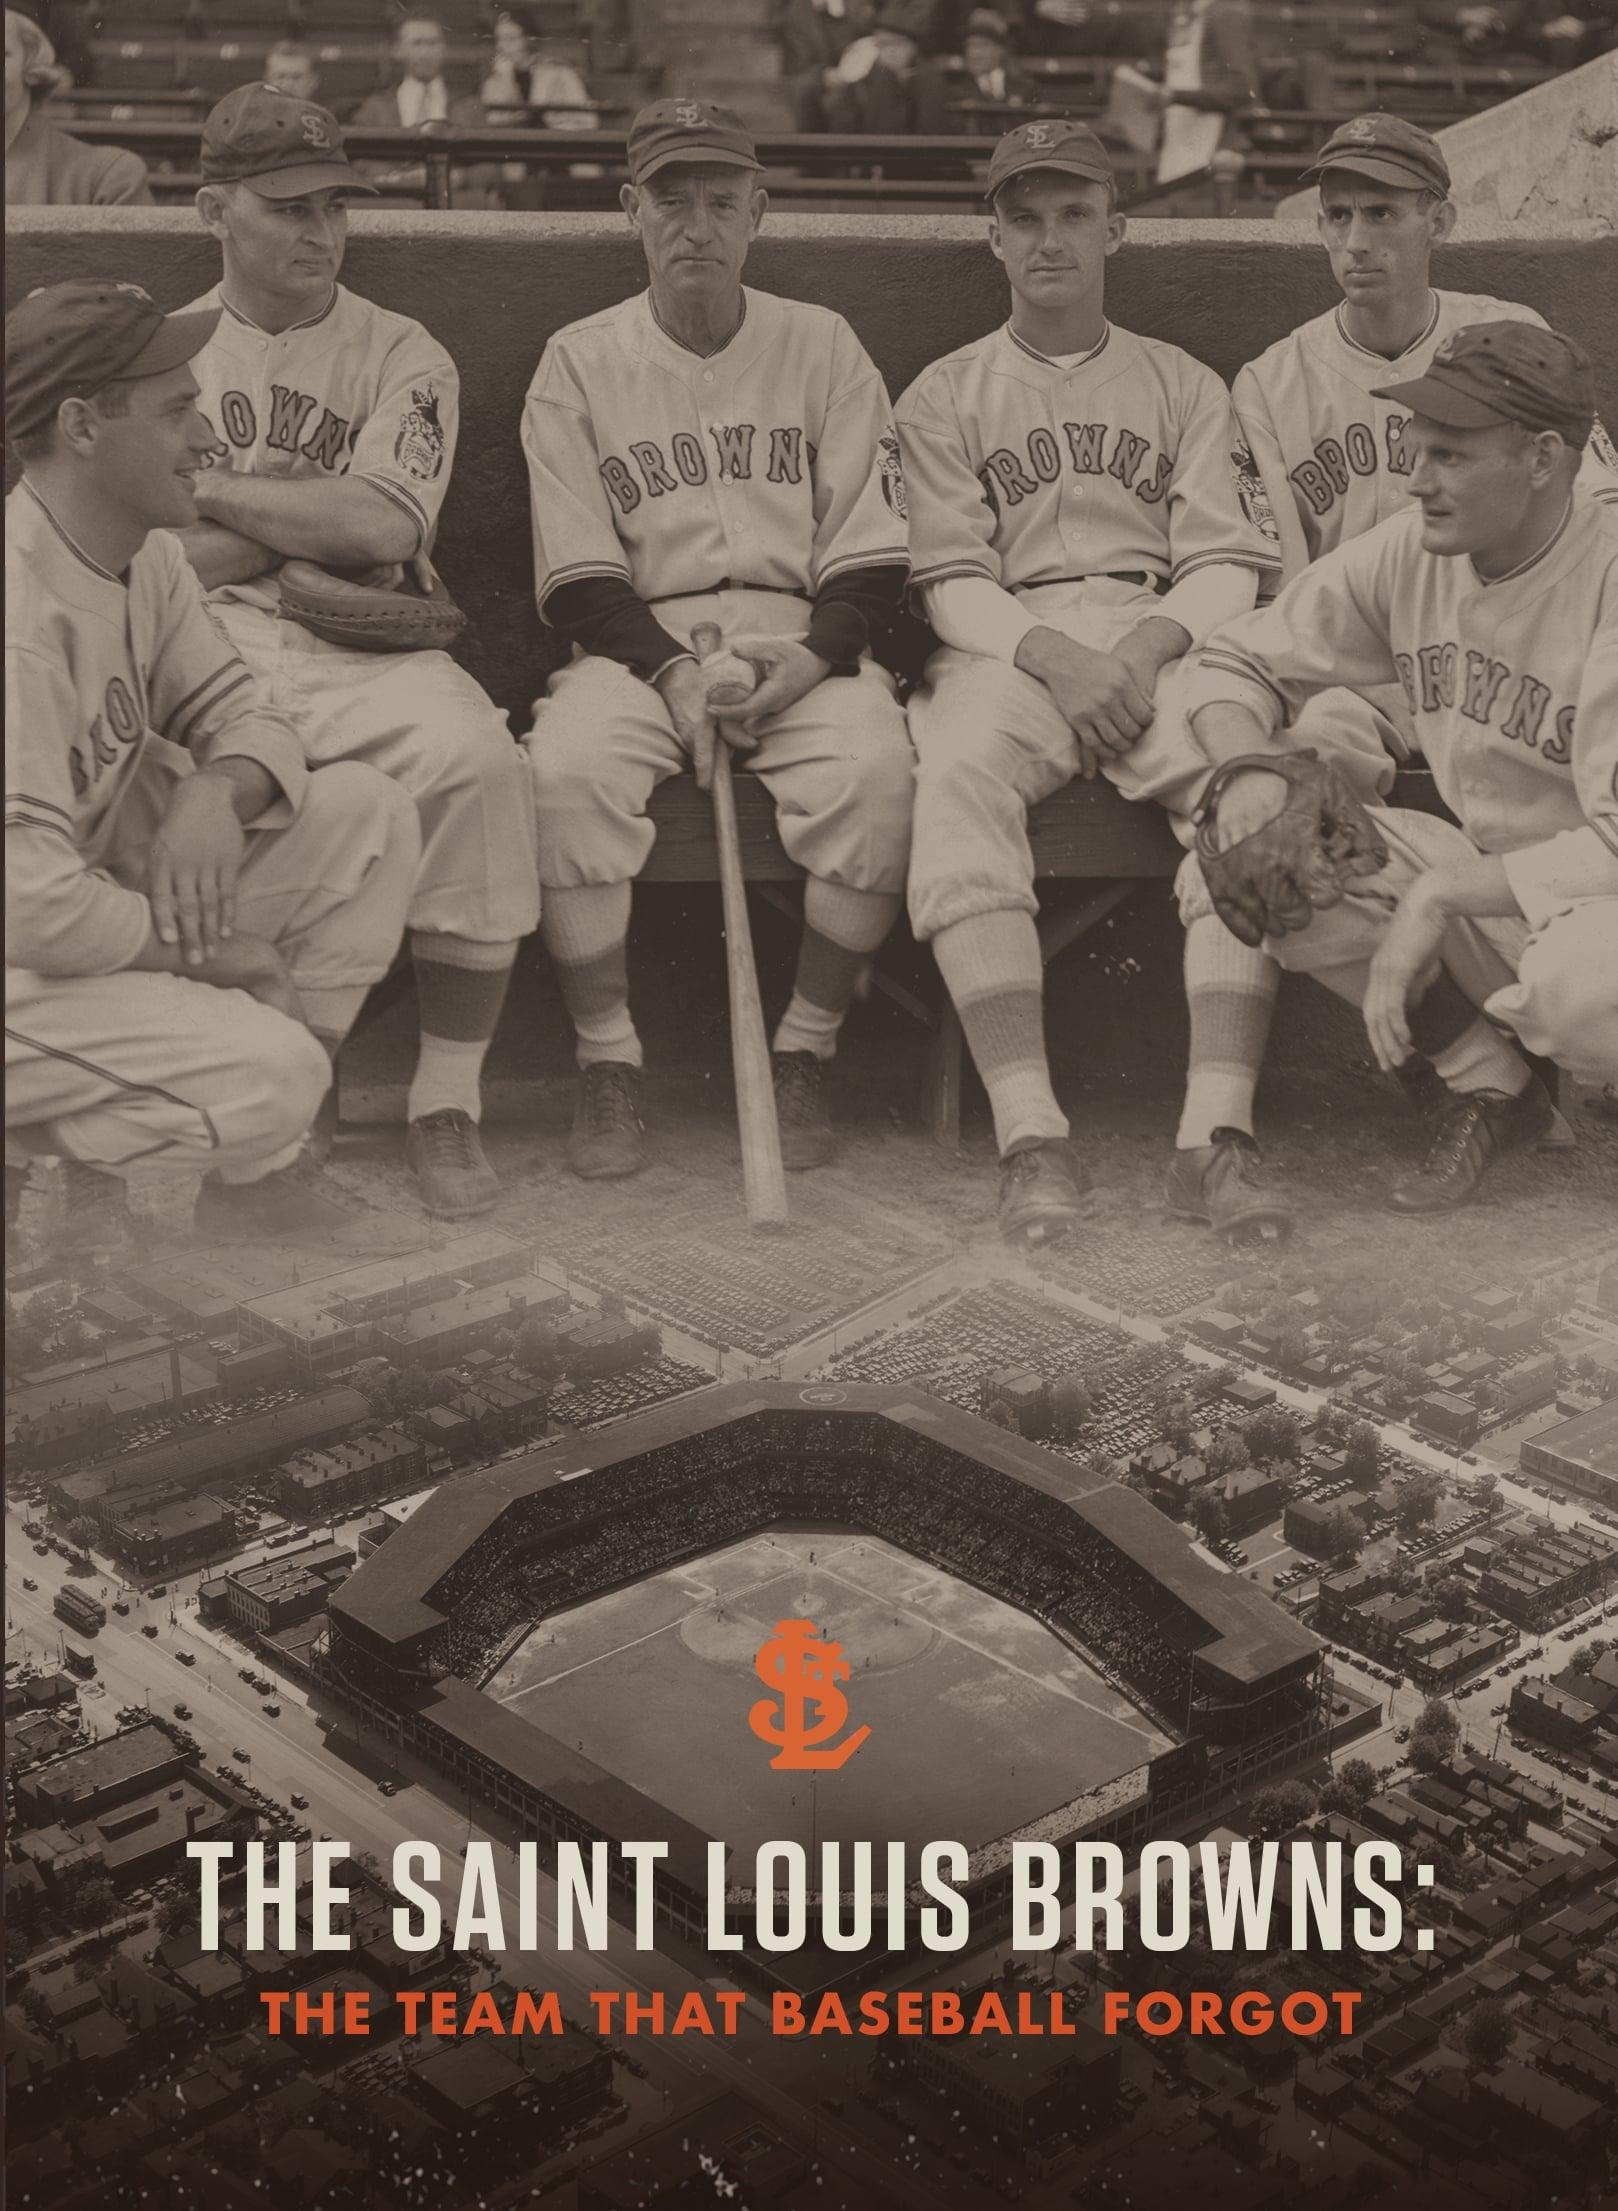 The Saint Louis Browns: The Team That Baseball Forgot